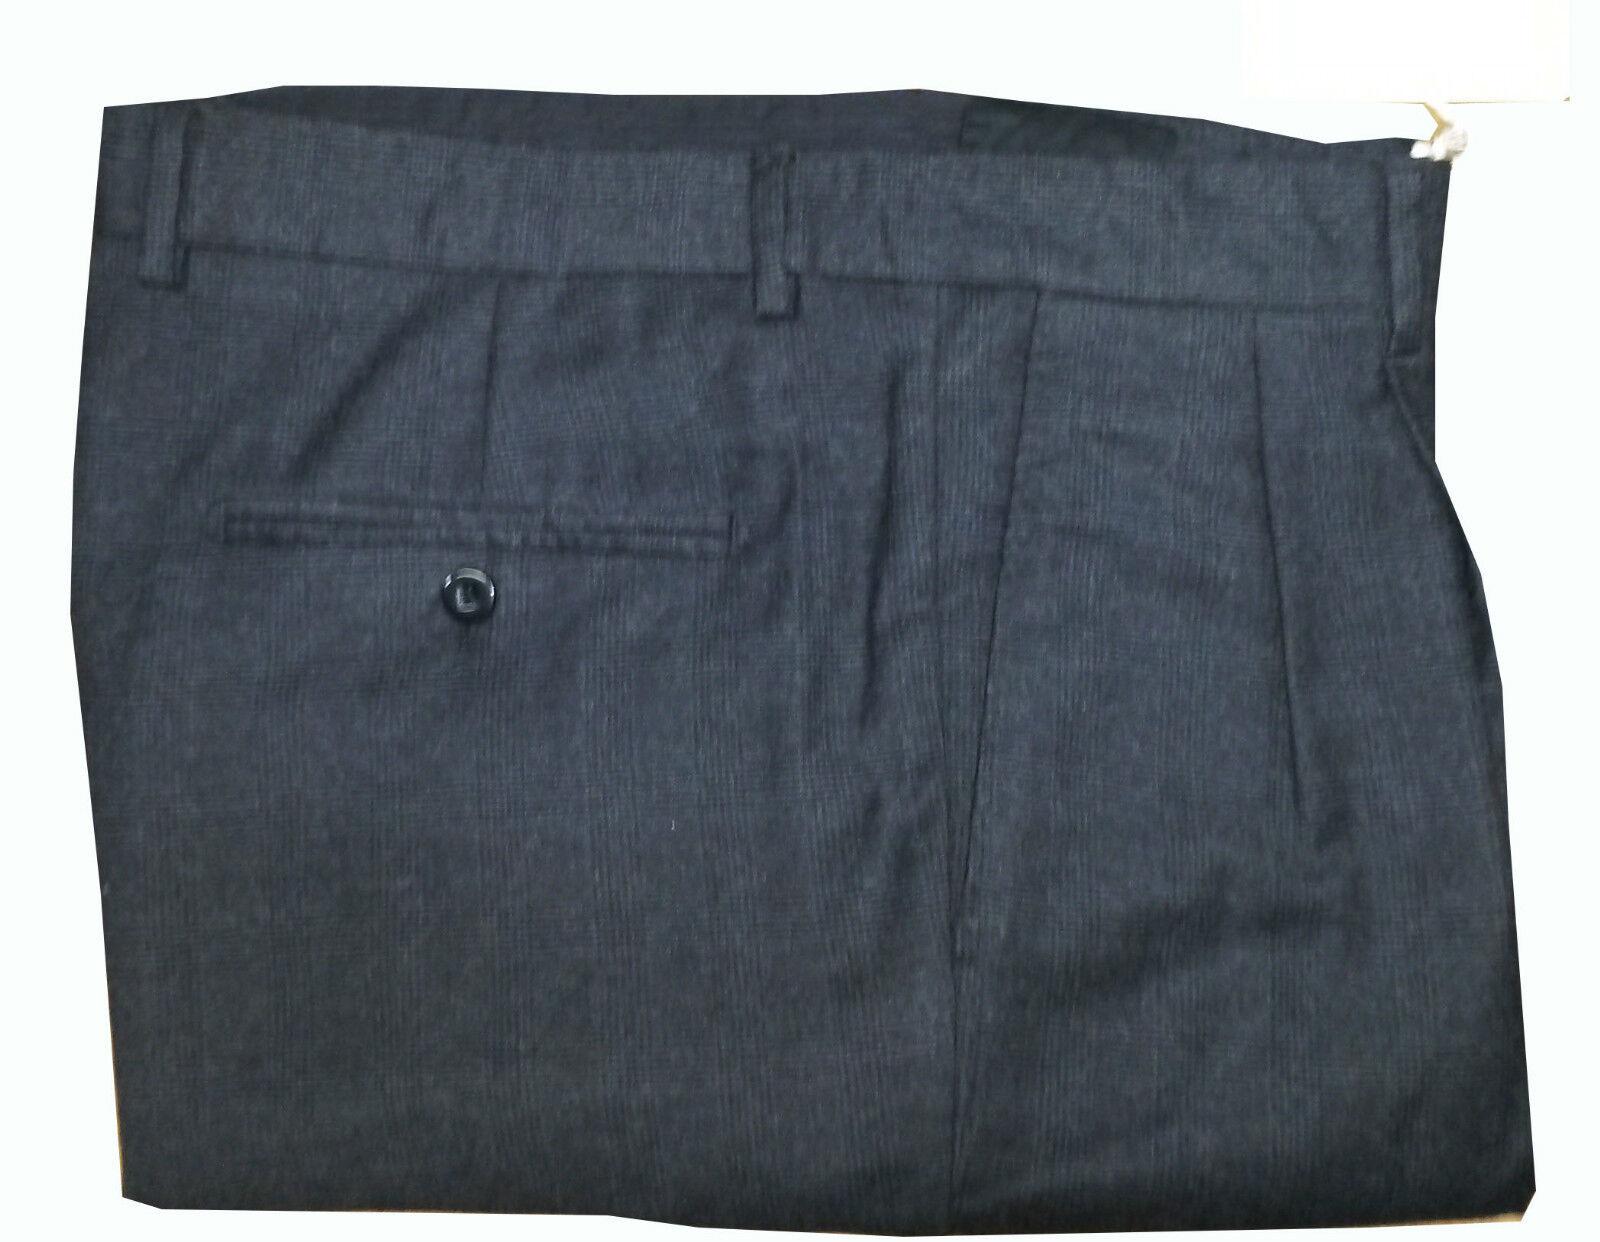 GRIFONI Pantalone due  pences galles gris 100% lana Made in   hasta un 65% de descuento